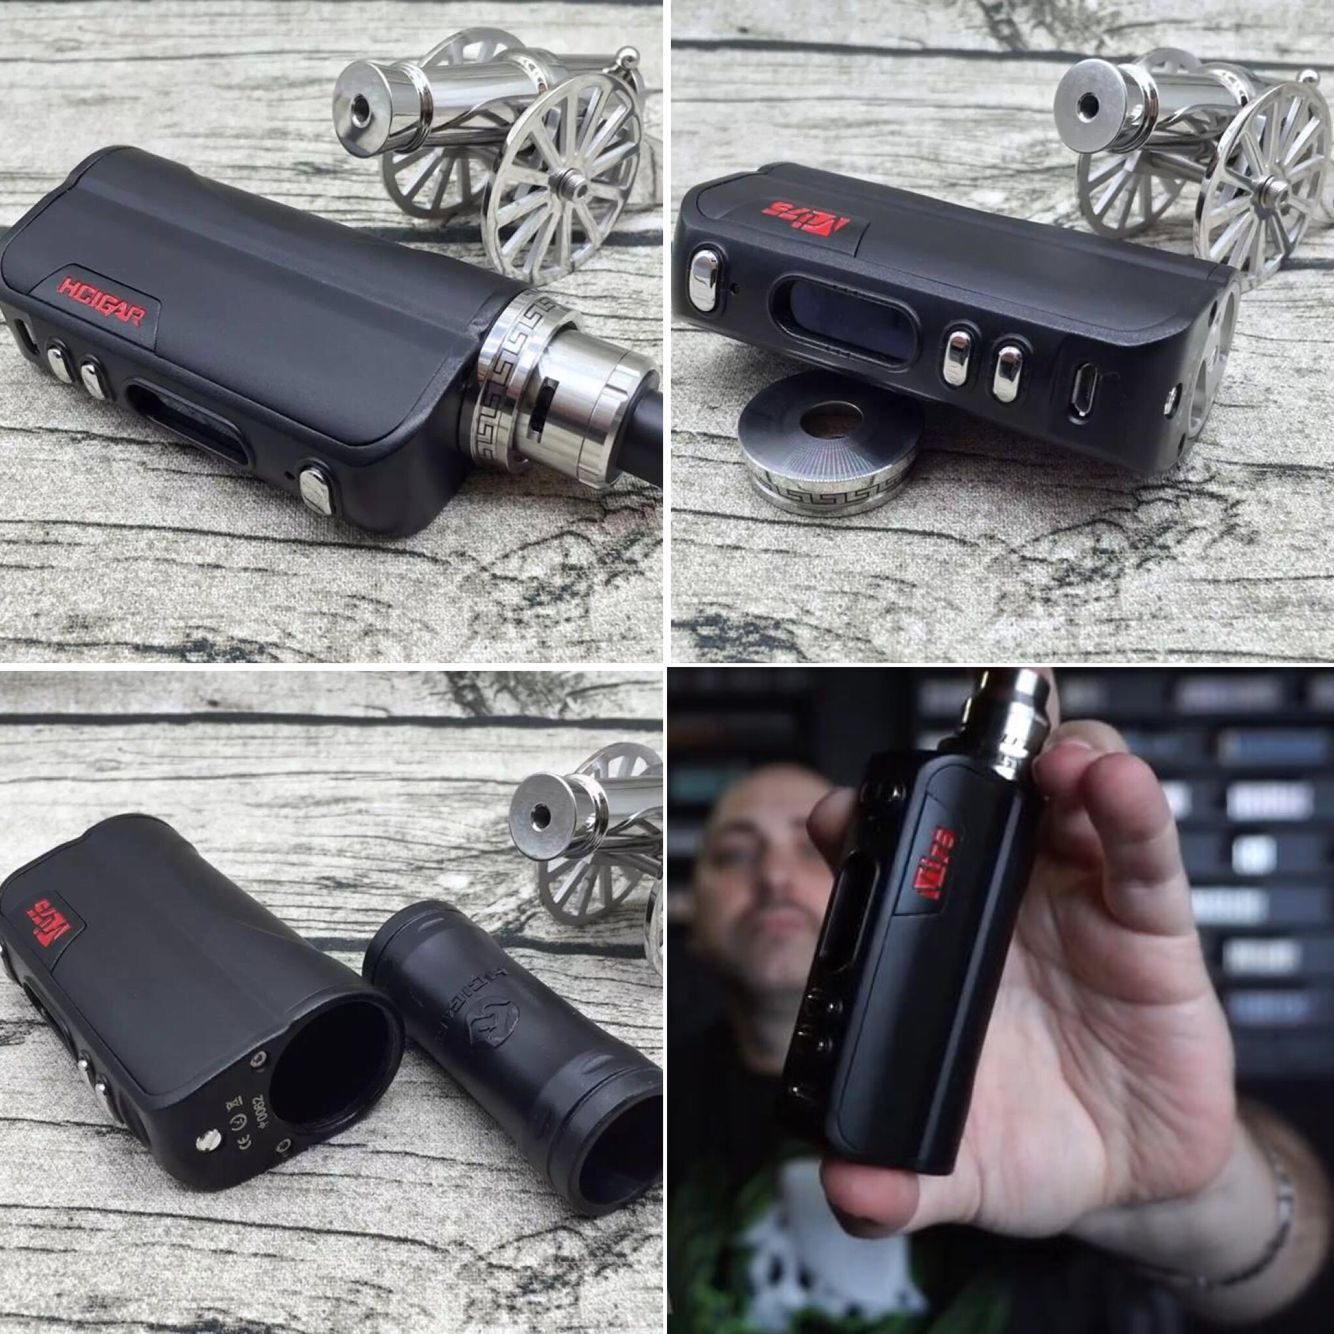 Hcigar Vt75 Evovl Dna75 Hcigar Vt75 Use 26650 18650 Battery Vt75 Vtbox Evolv Vaping Vapepics Vapefam Vapebabes Vape Vape Vape Mods Original Designs